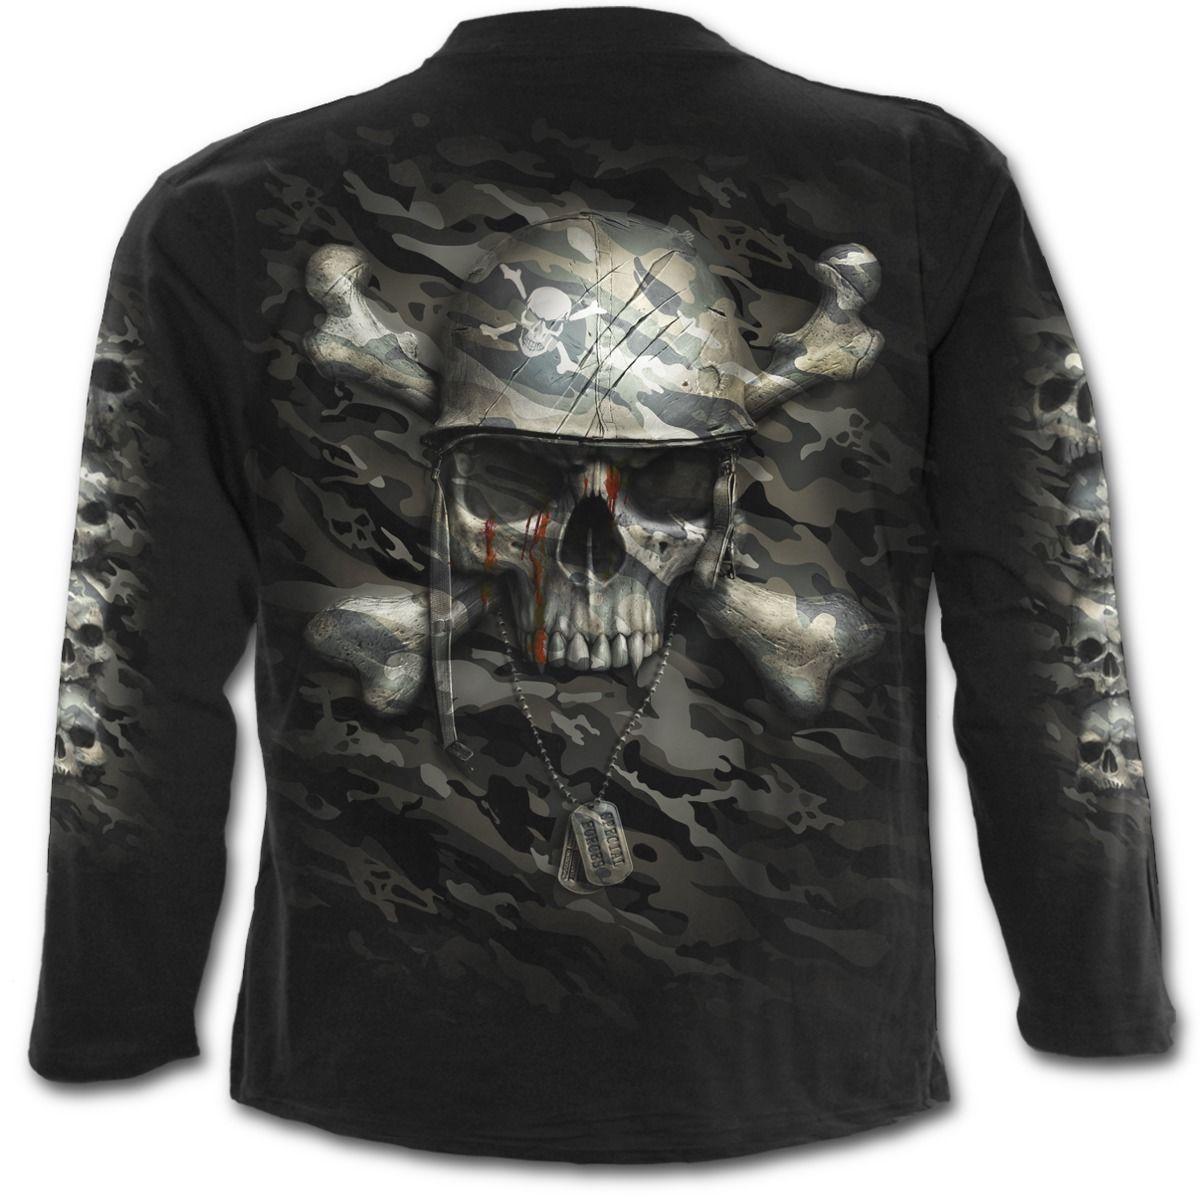 rebelsmarket_men_s_new_army_skull_long_sleeve_black_t_shirt_t_shirts_3.jpg